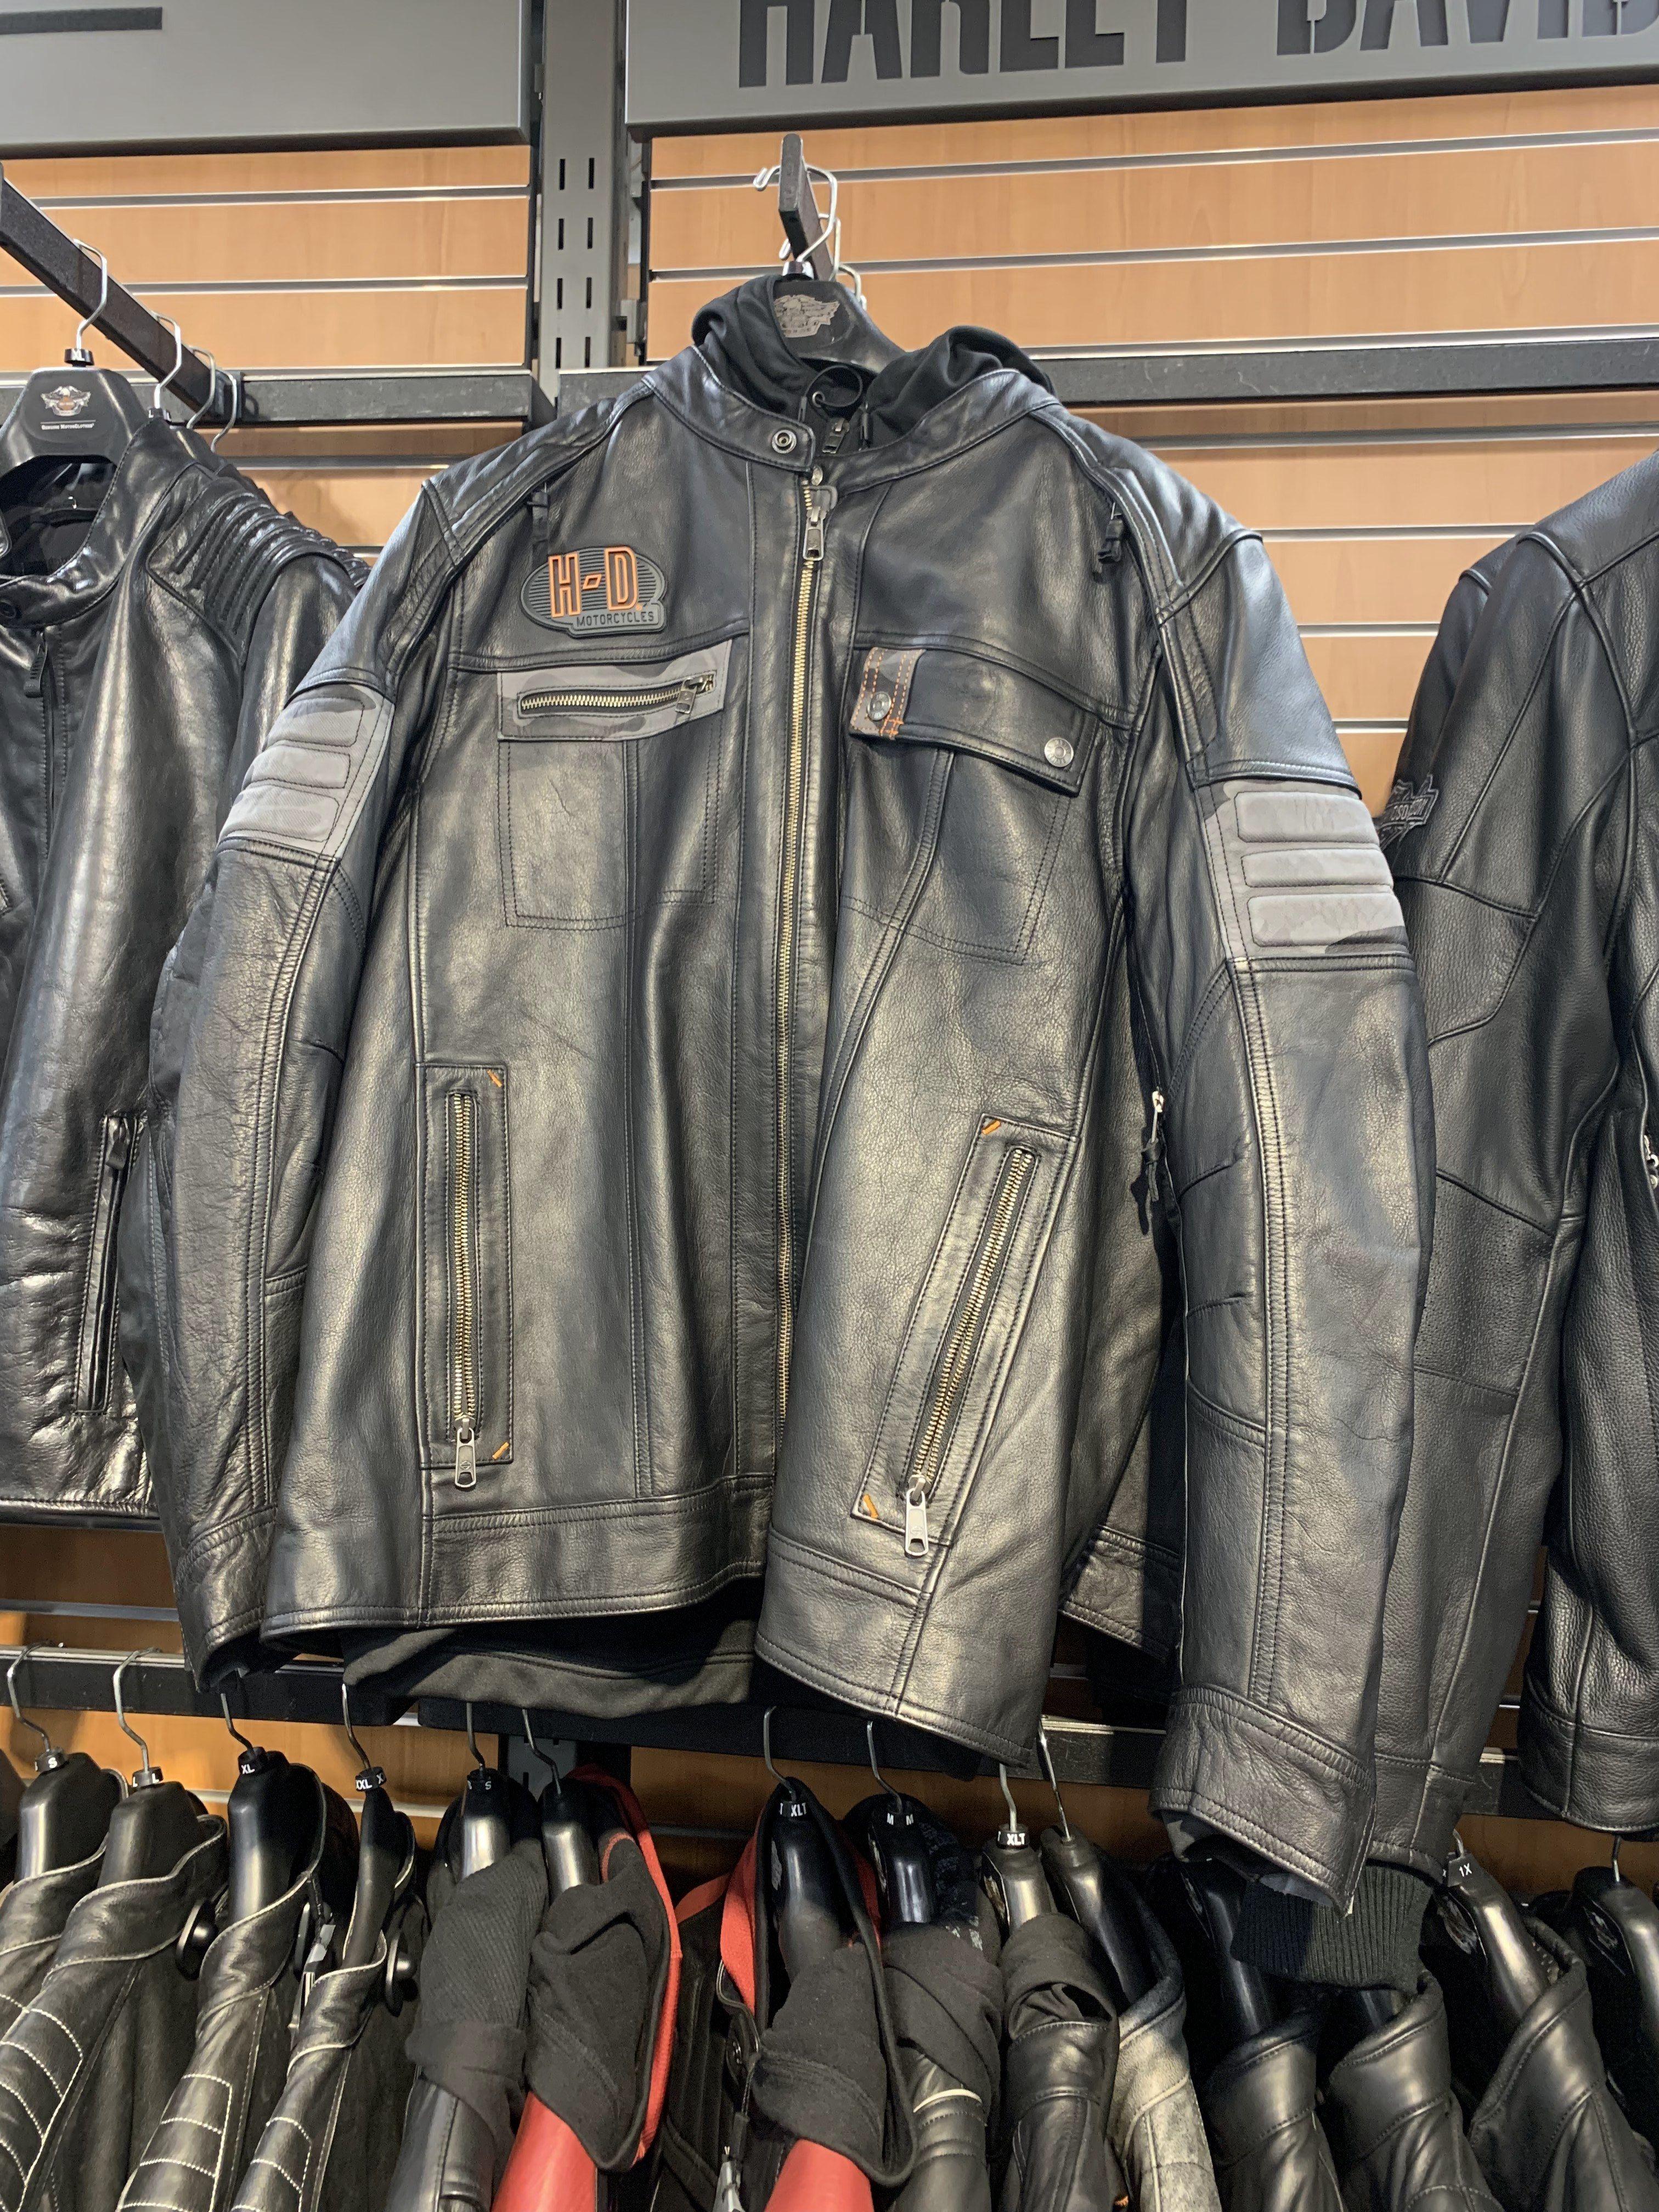 Classic Harley Davidson Jacket Harley Davidson Leather Jackets Leather Jacket Harley Davidson Jacket [ 4032 x 3024 Pixel ]